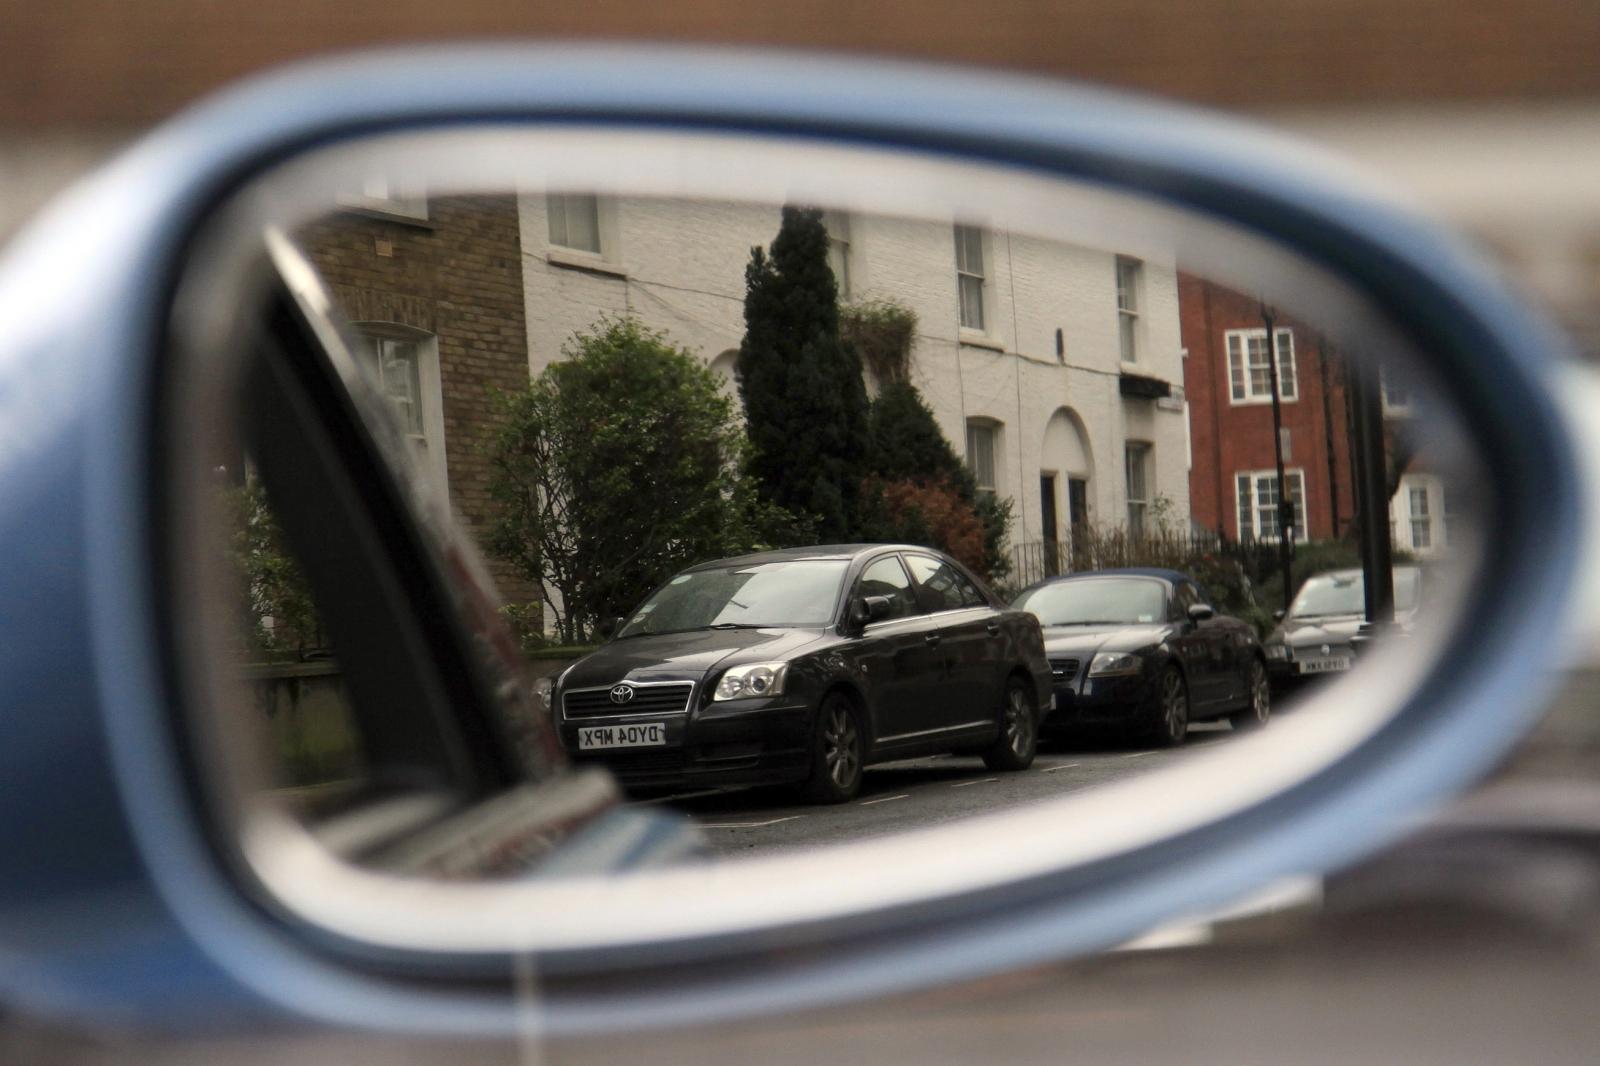 Car parking London